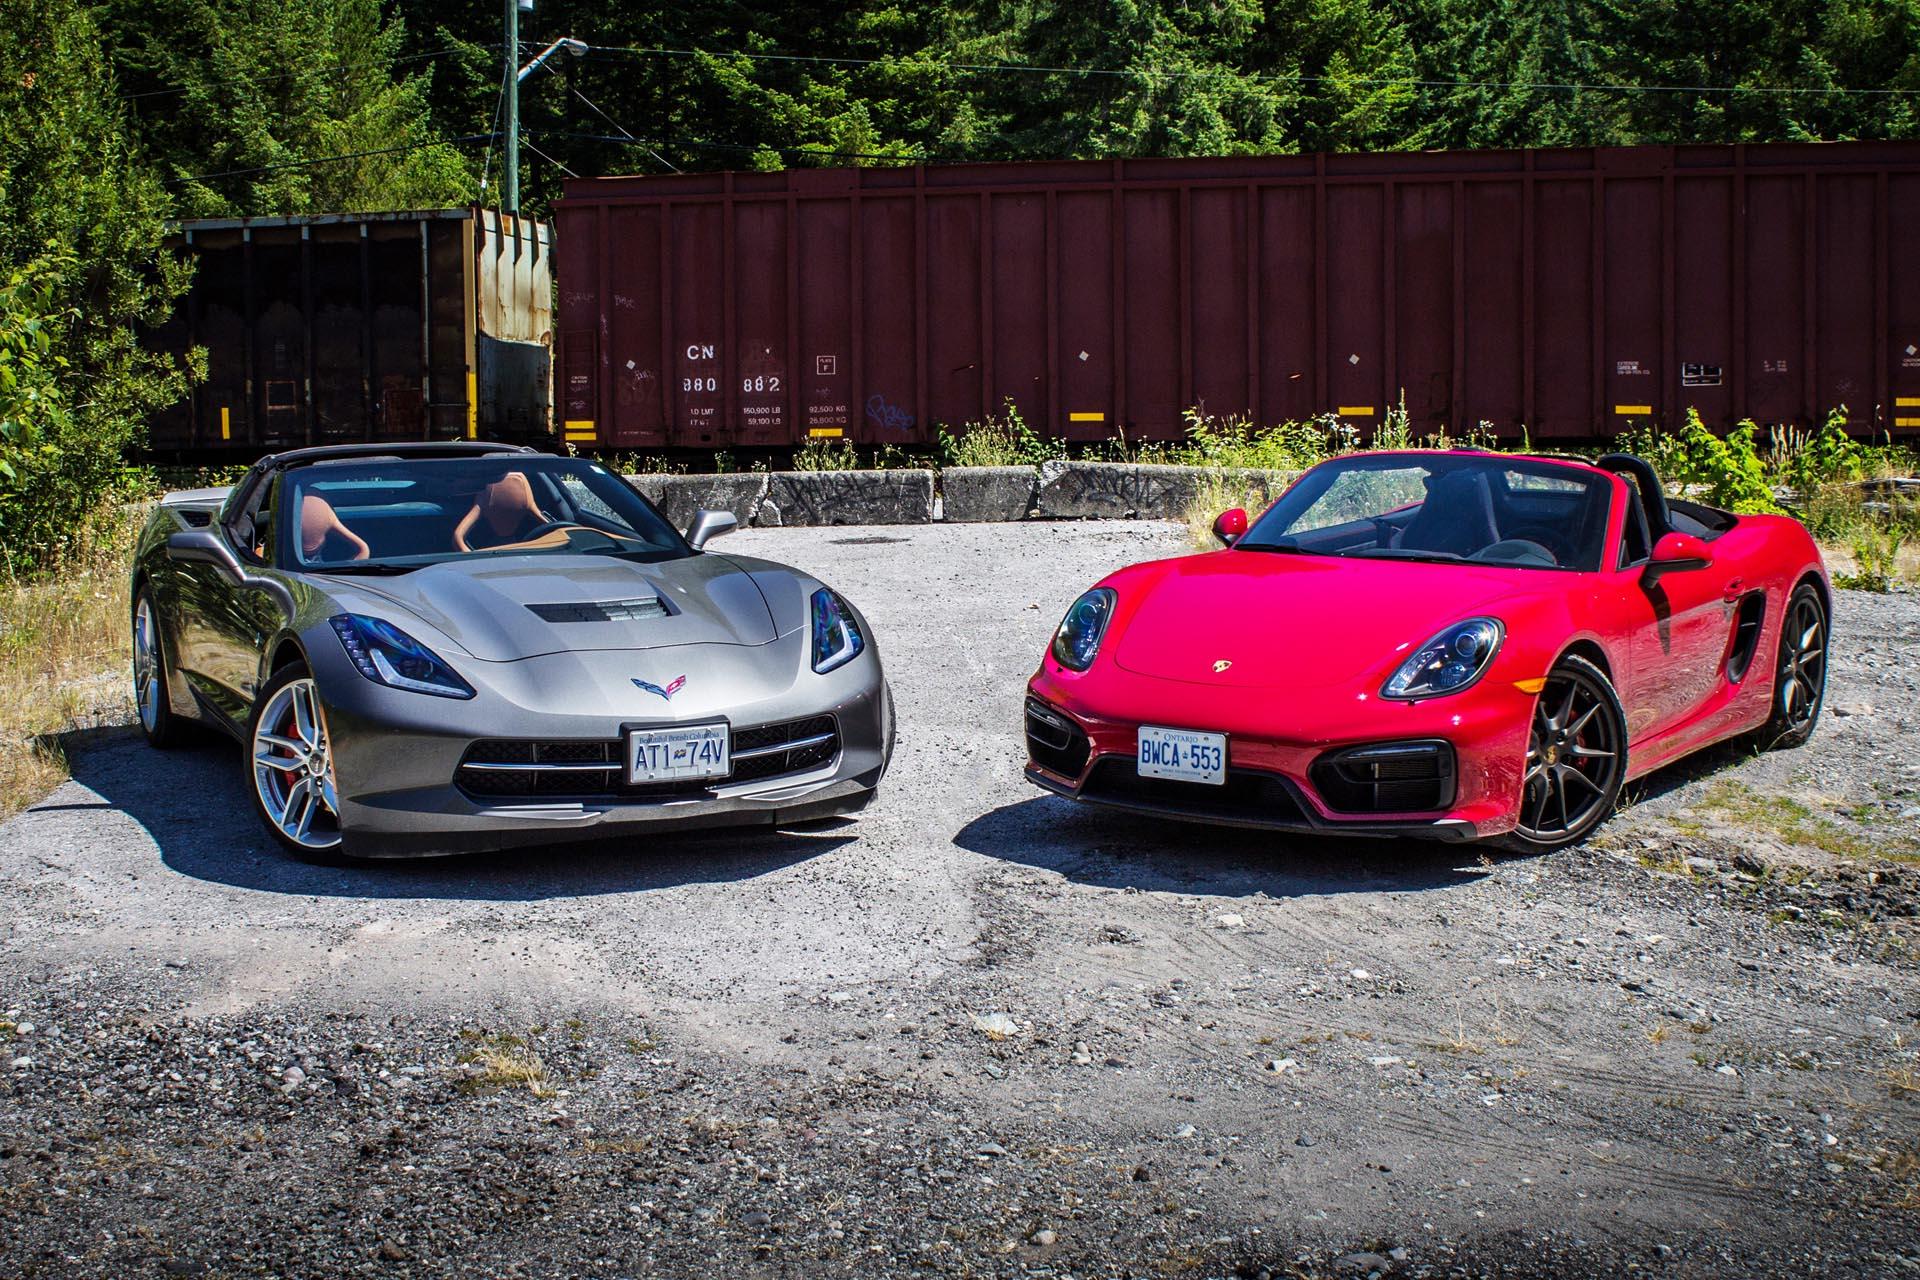 2006 Porsche Boxster >> Comparison Test: 2015 Chevrolet Corvette Stingray vs 2015 Porsche Boxster GTS - Autos.ca